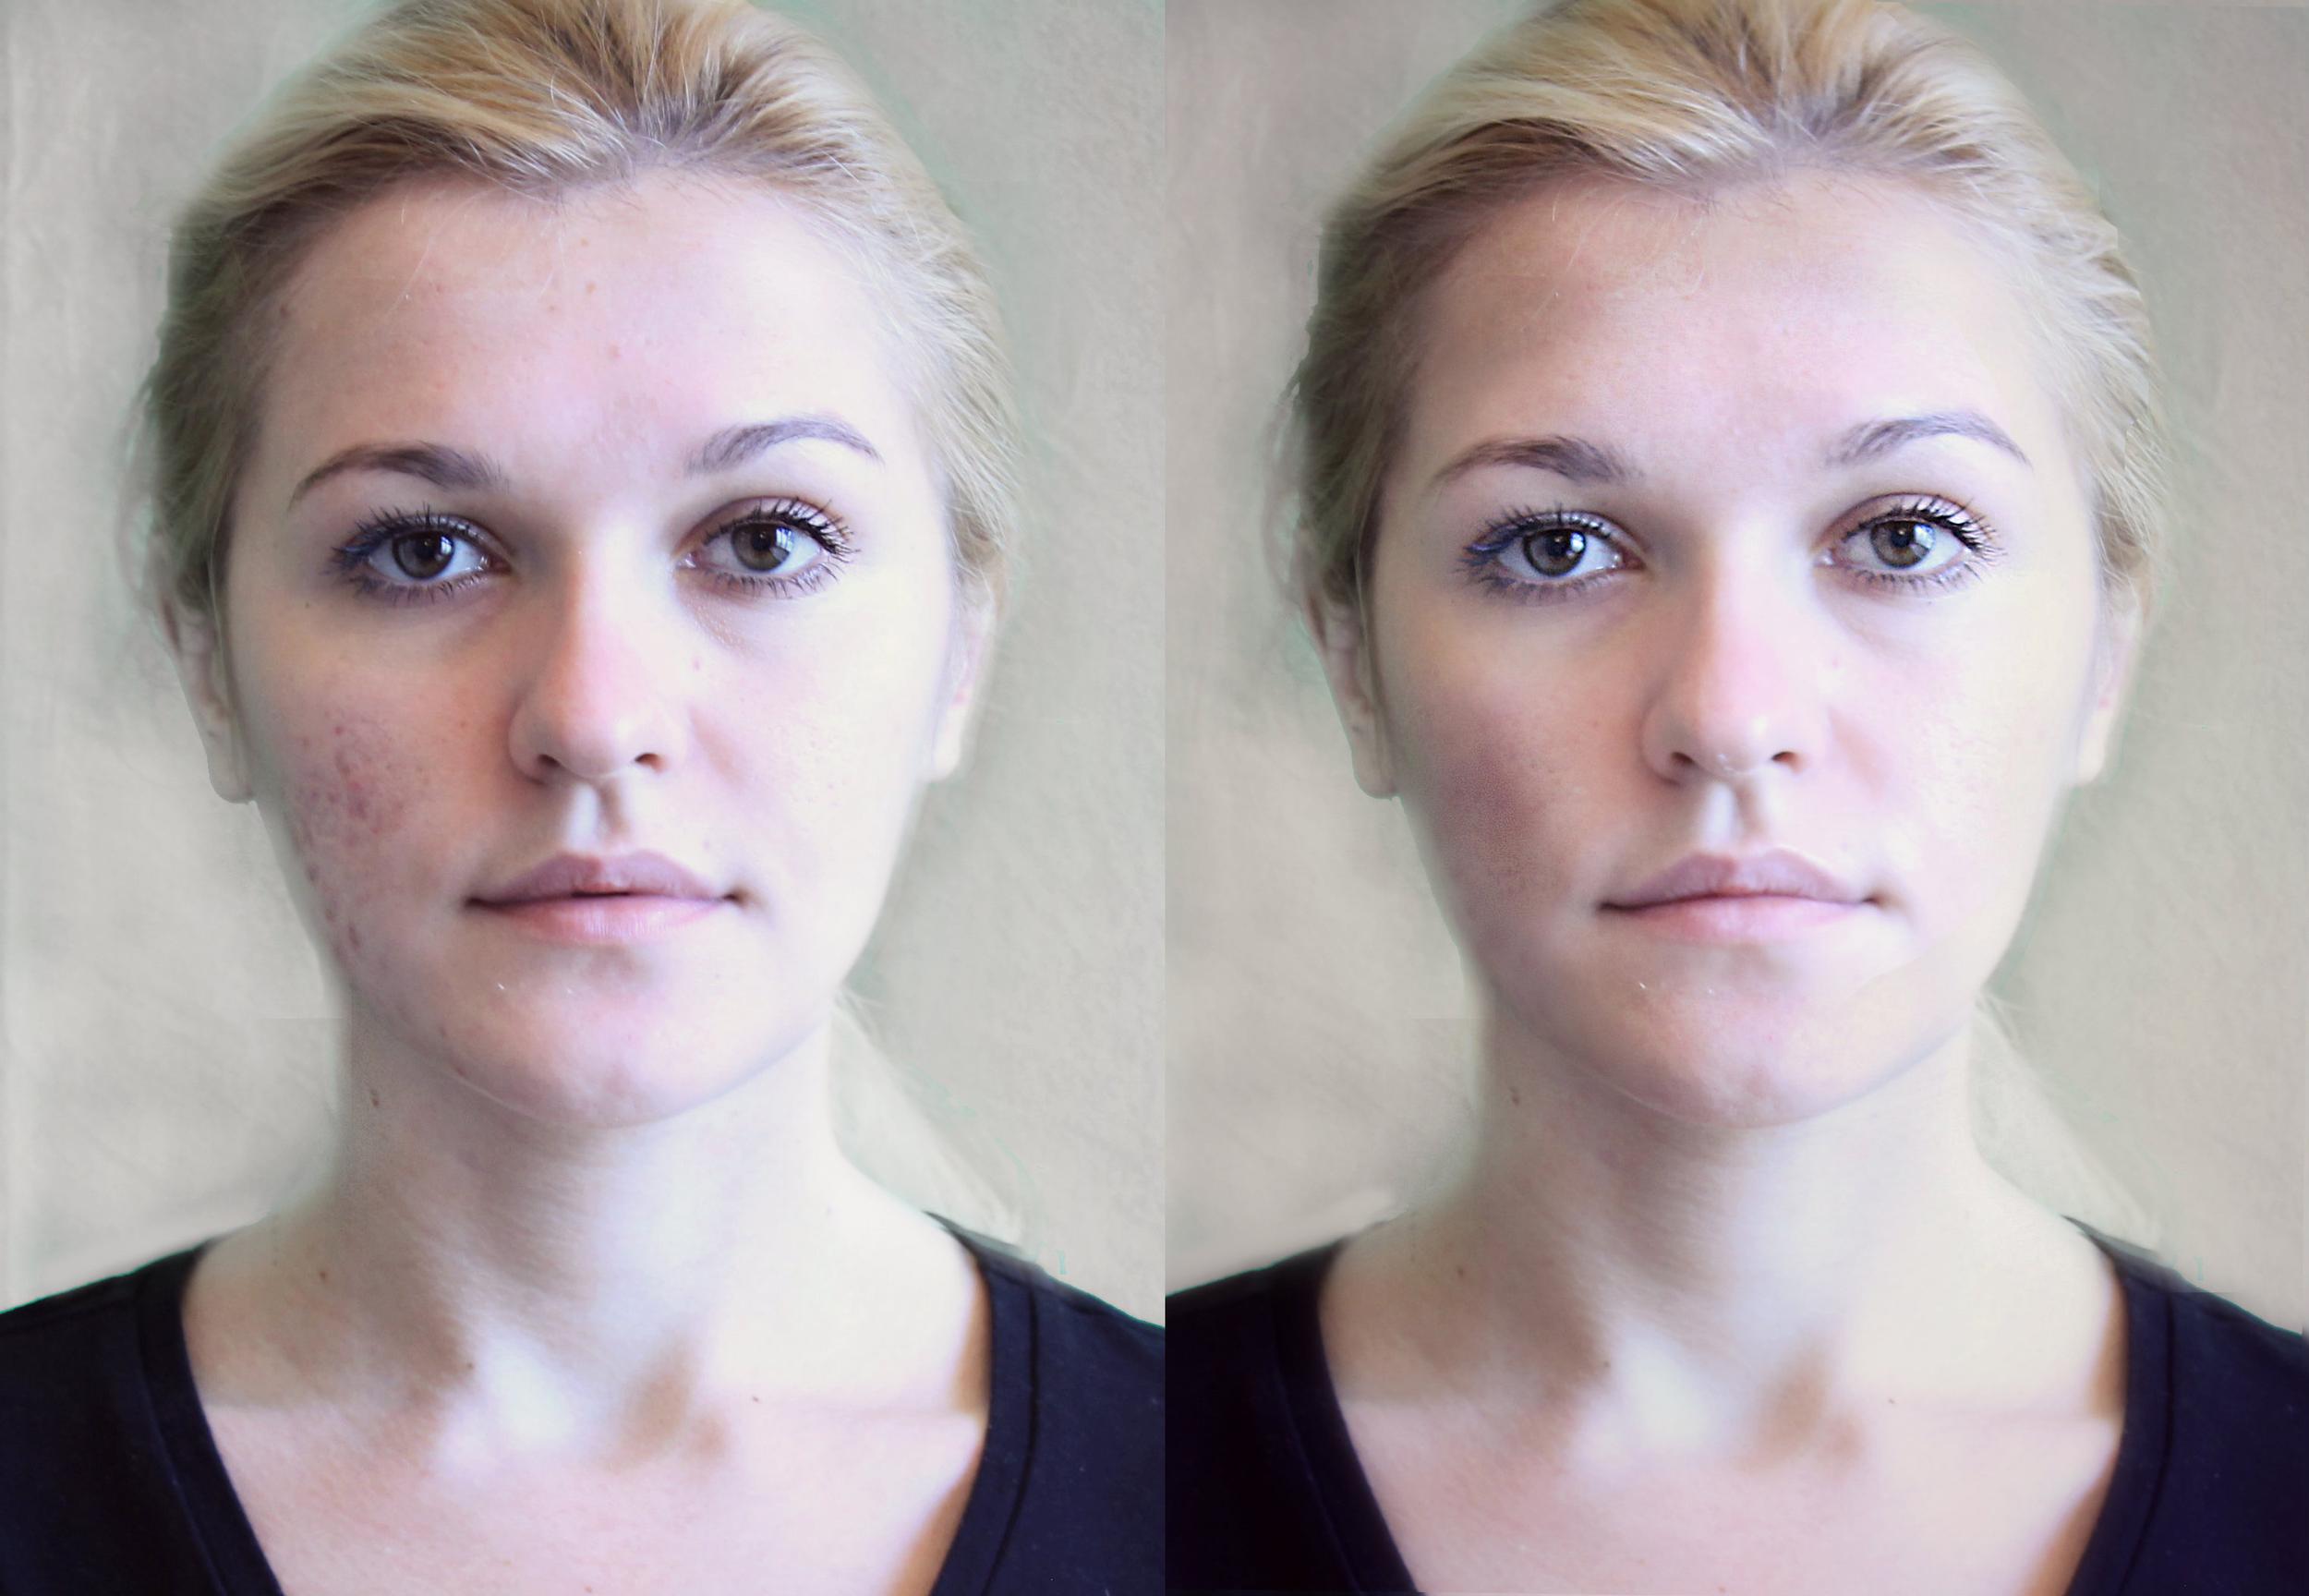 Photo retouching simulates productresults